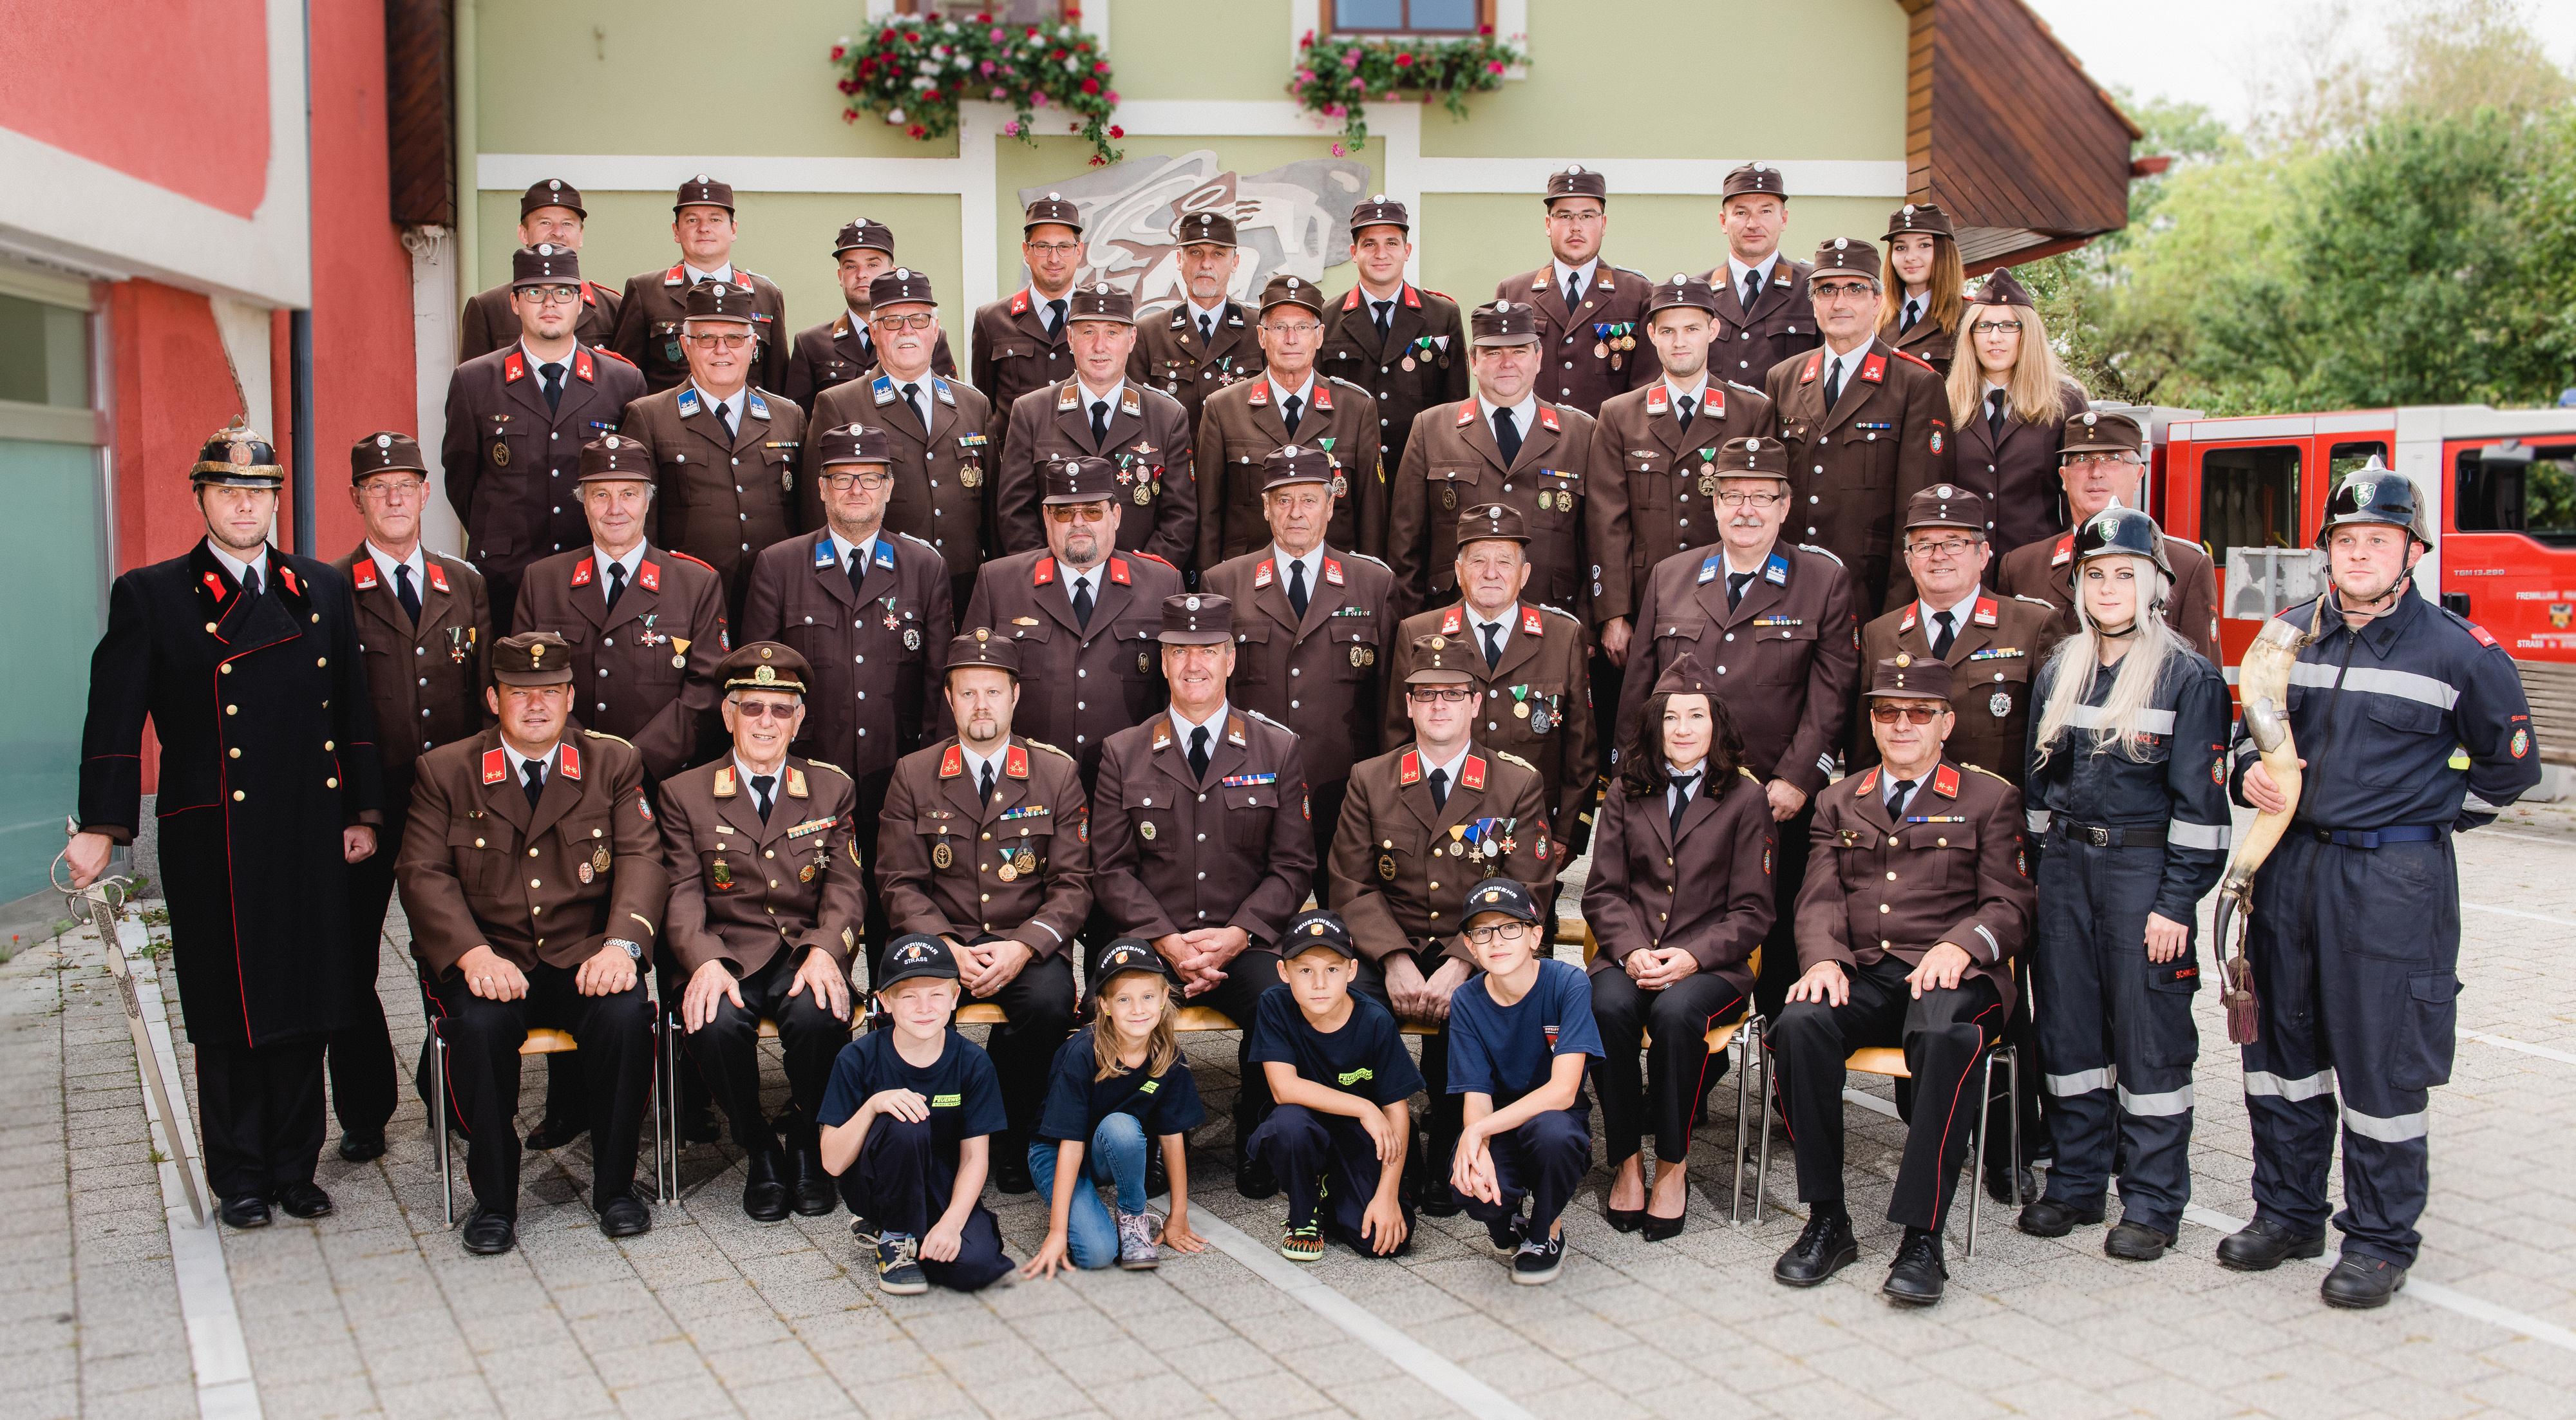 Originalbild unter: http://rupertrauch.fotograf.de/photo/57d5dc50-d1c8-43eb-9af0-426b0a61927c